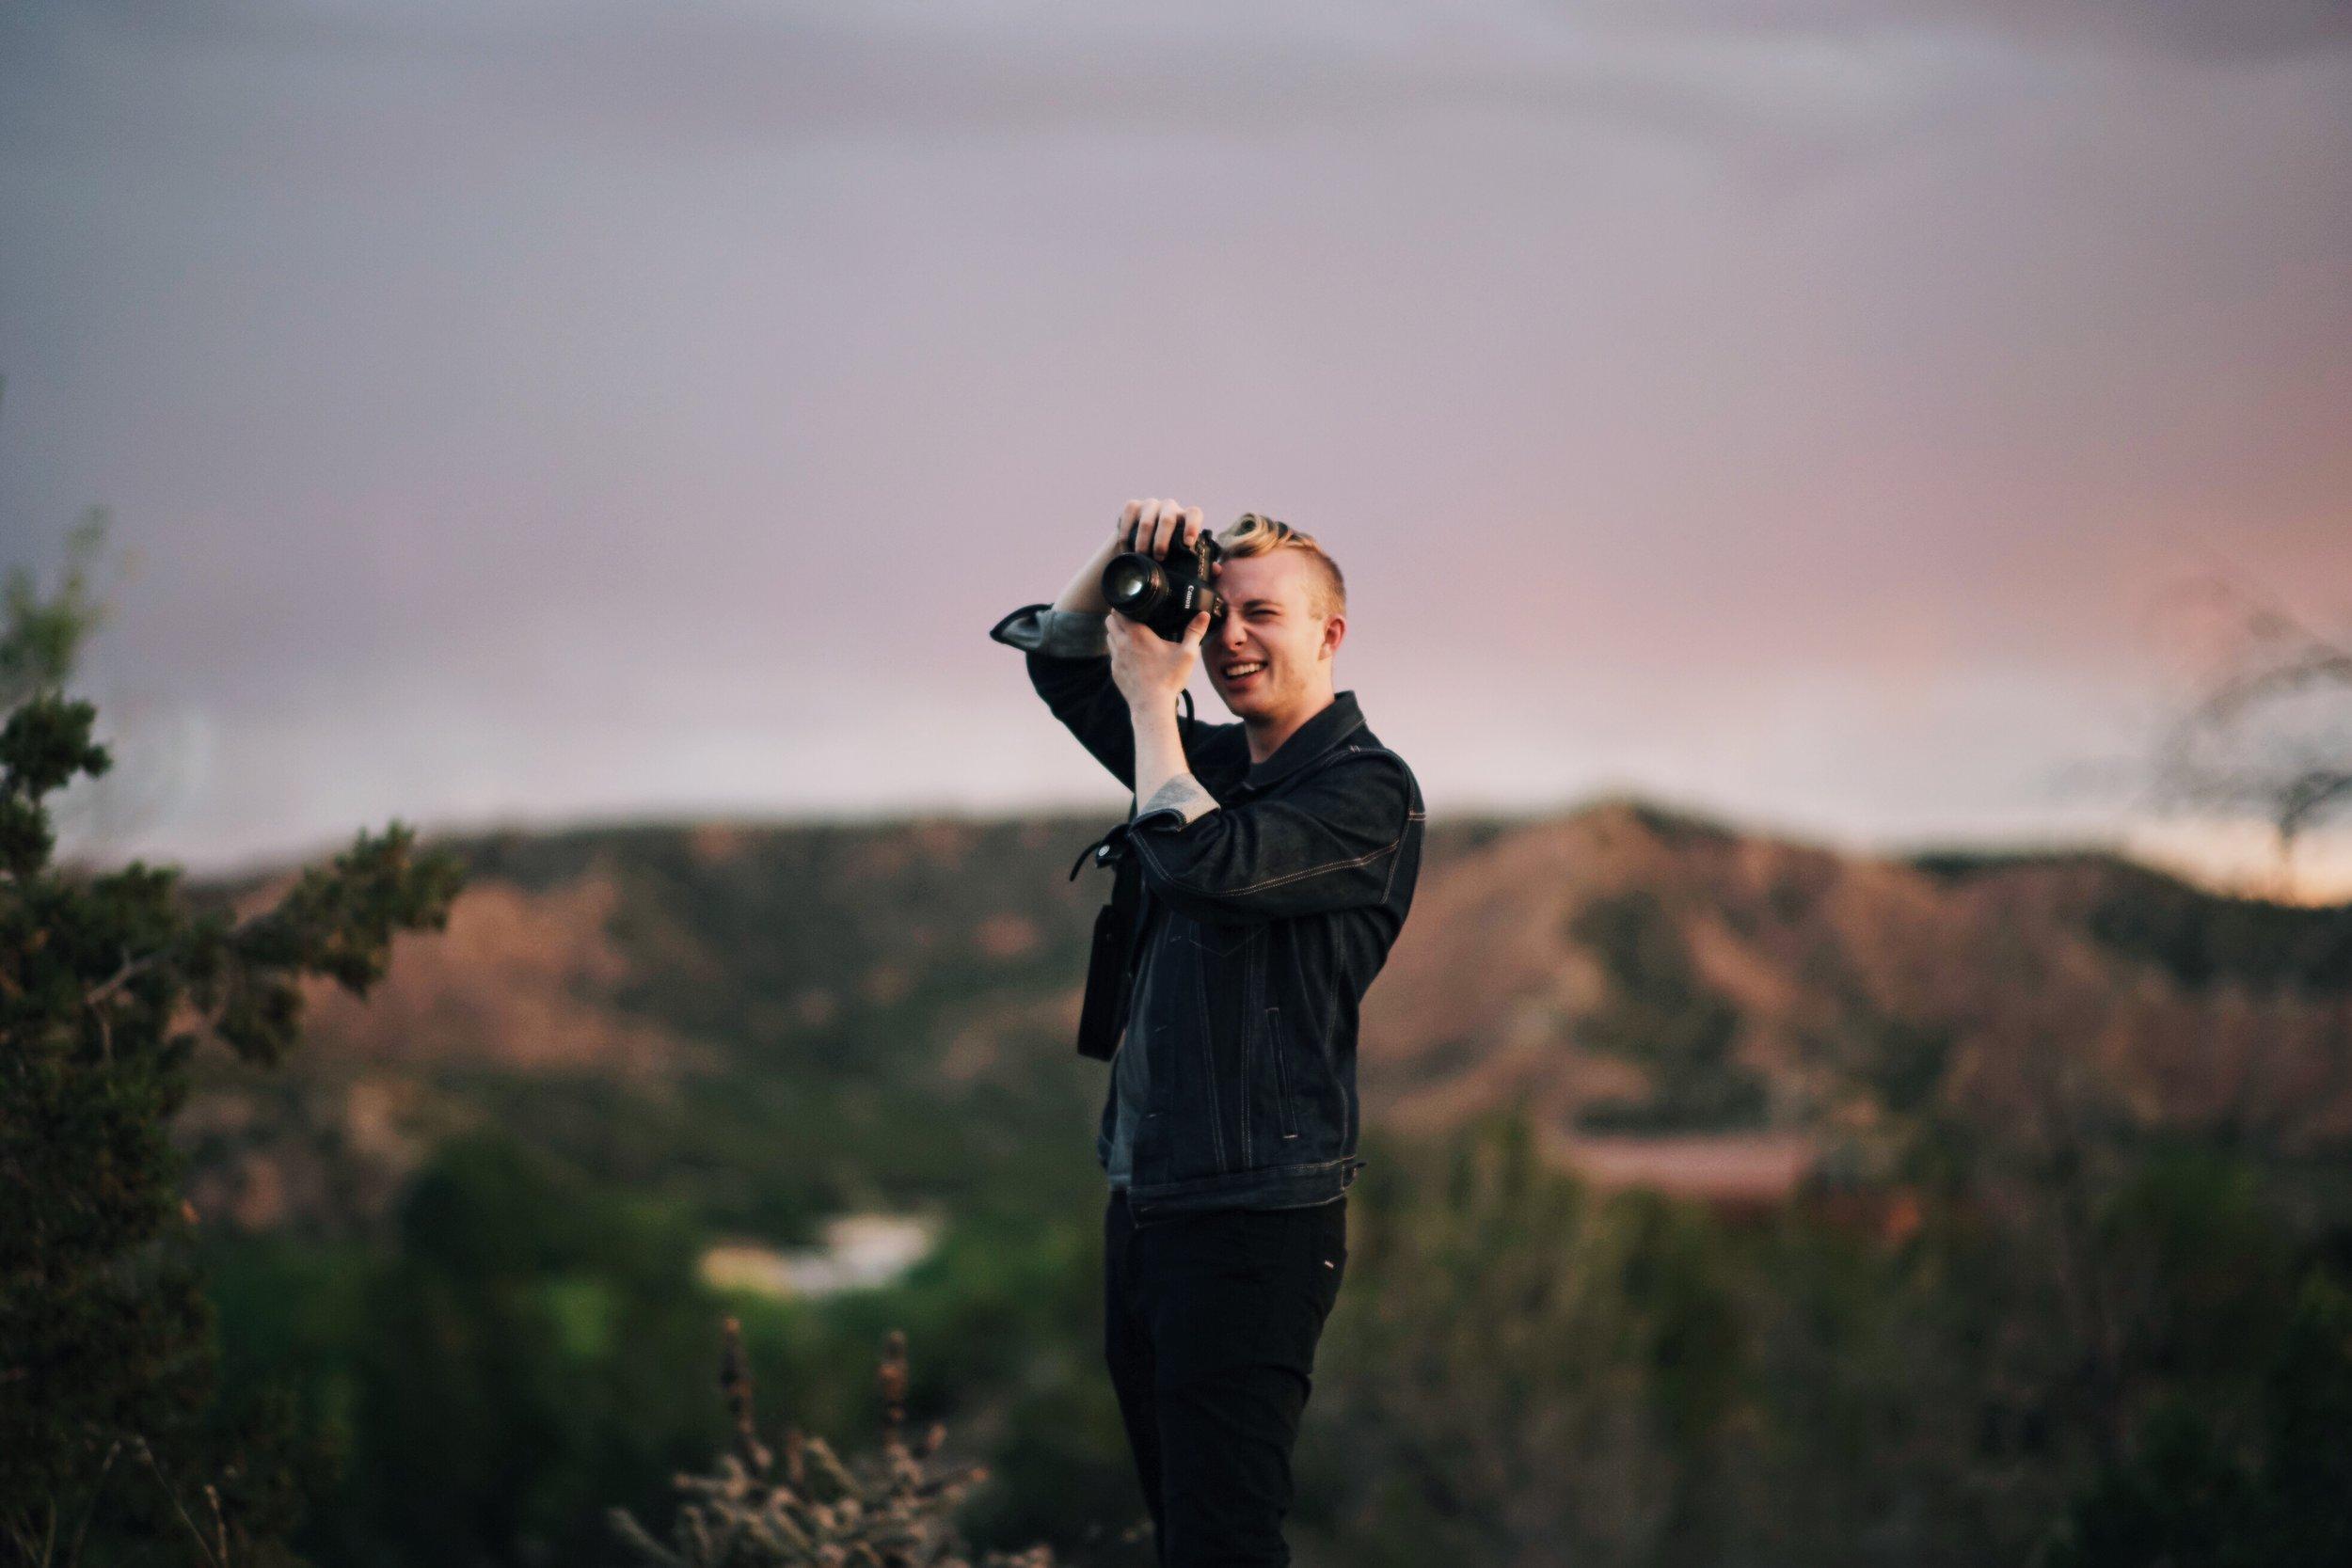 Photo by Adam Shaening-Pokrasso